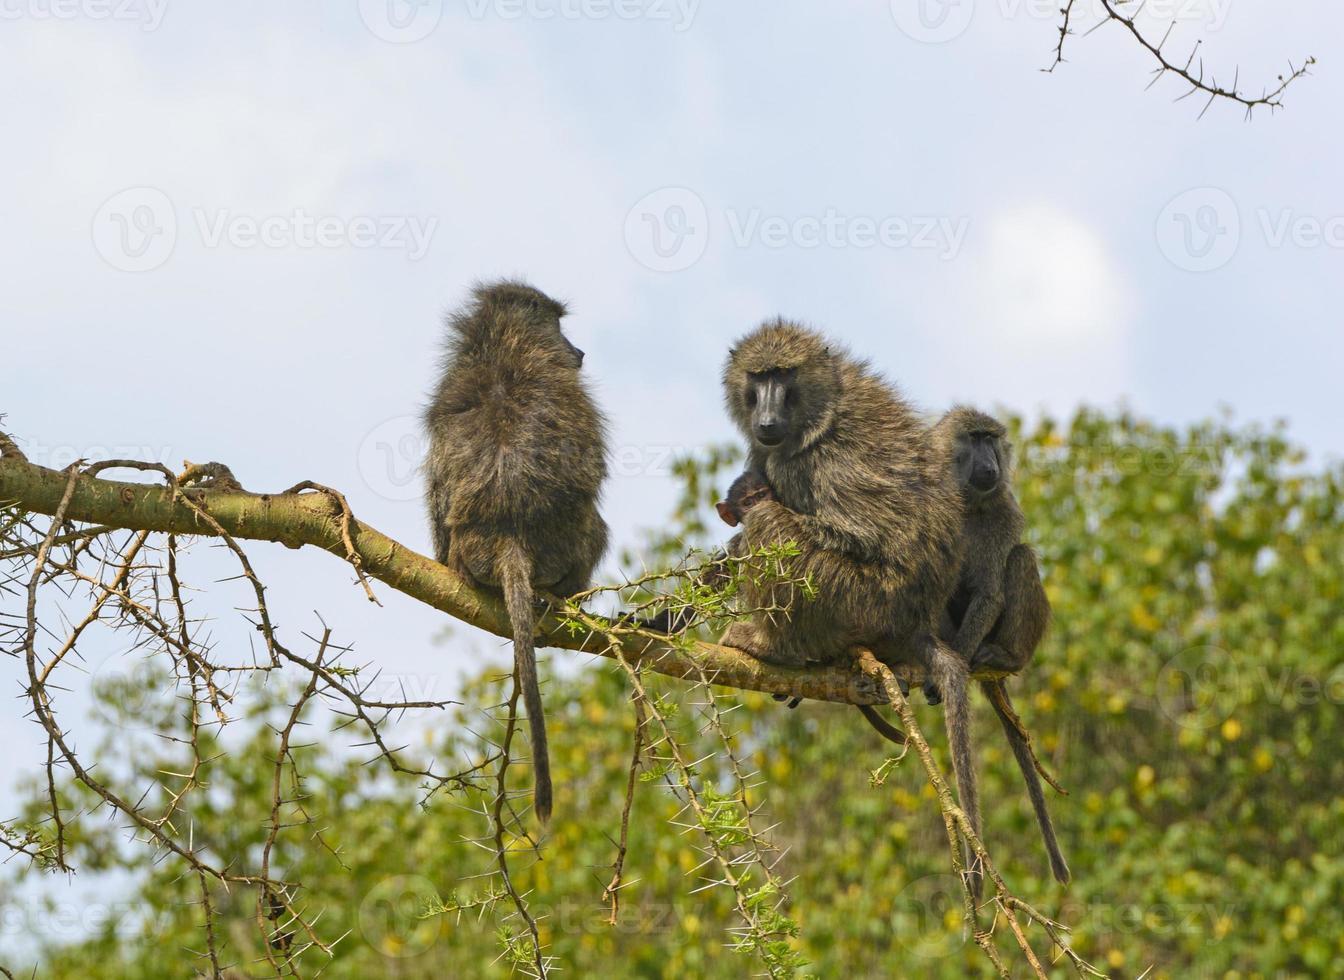 babian familj i ett träd foto